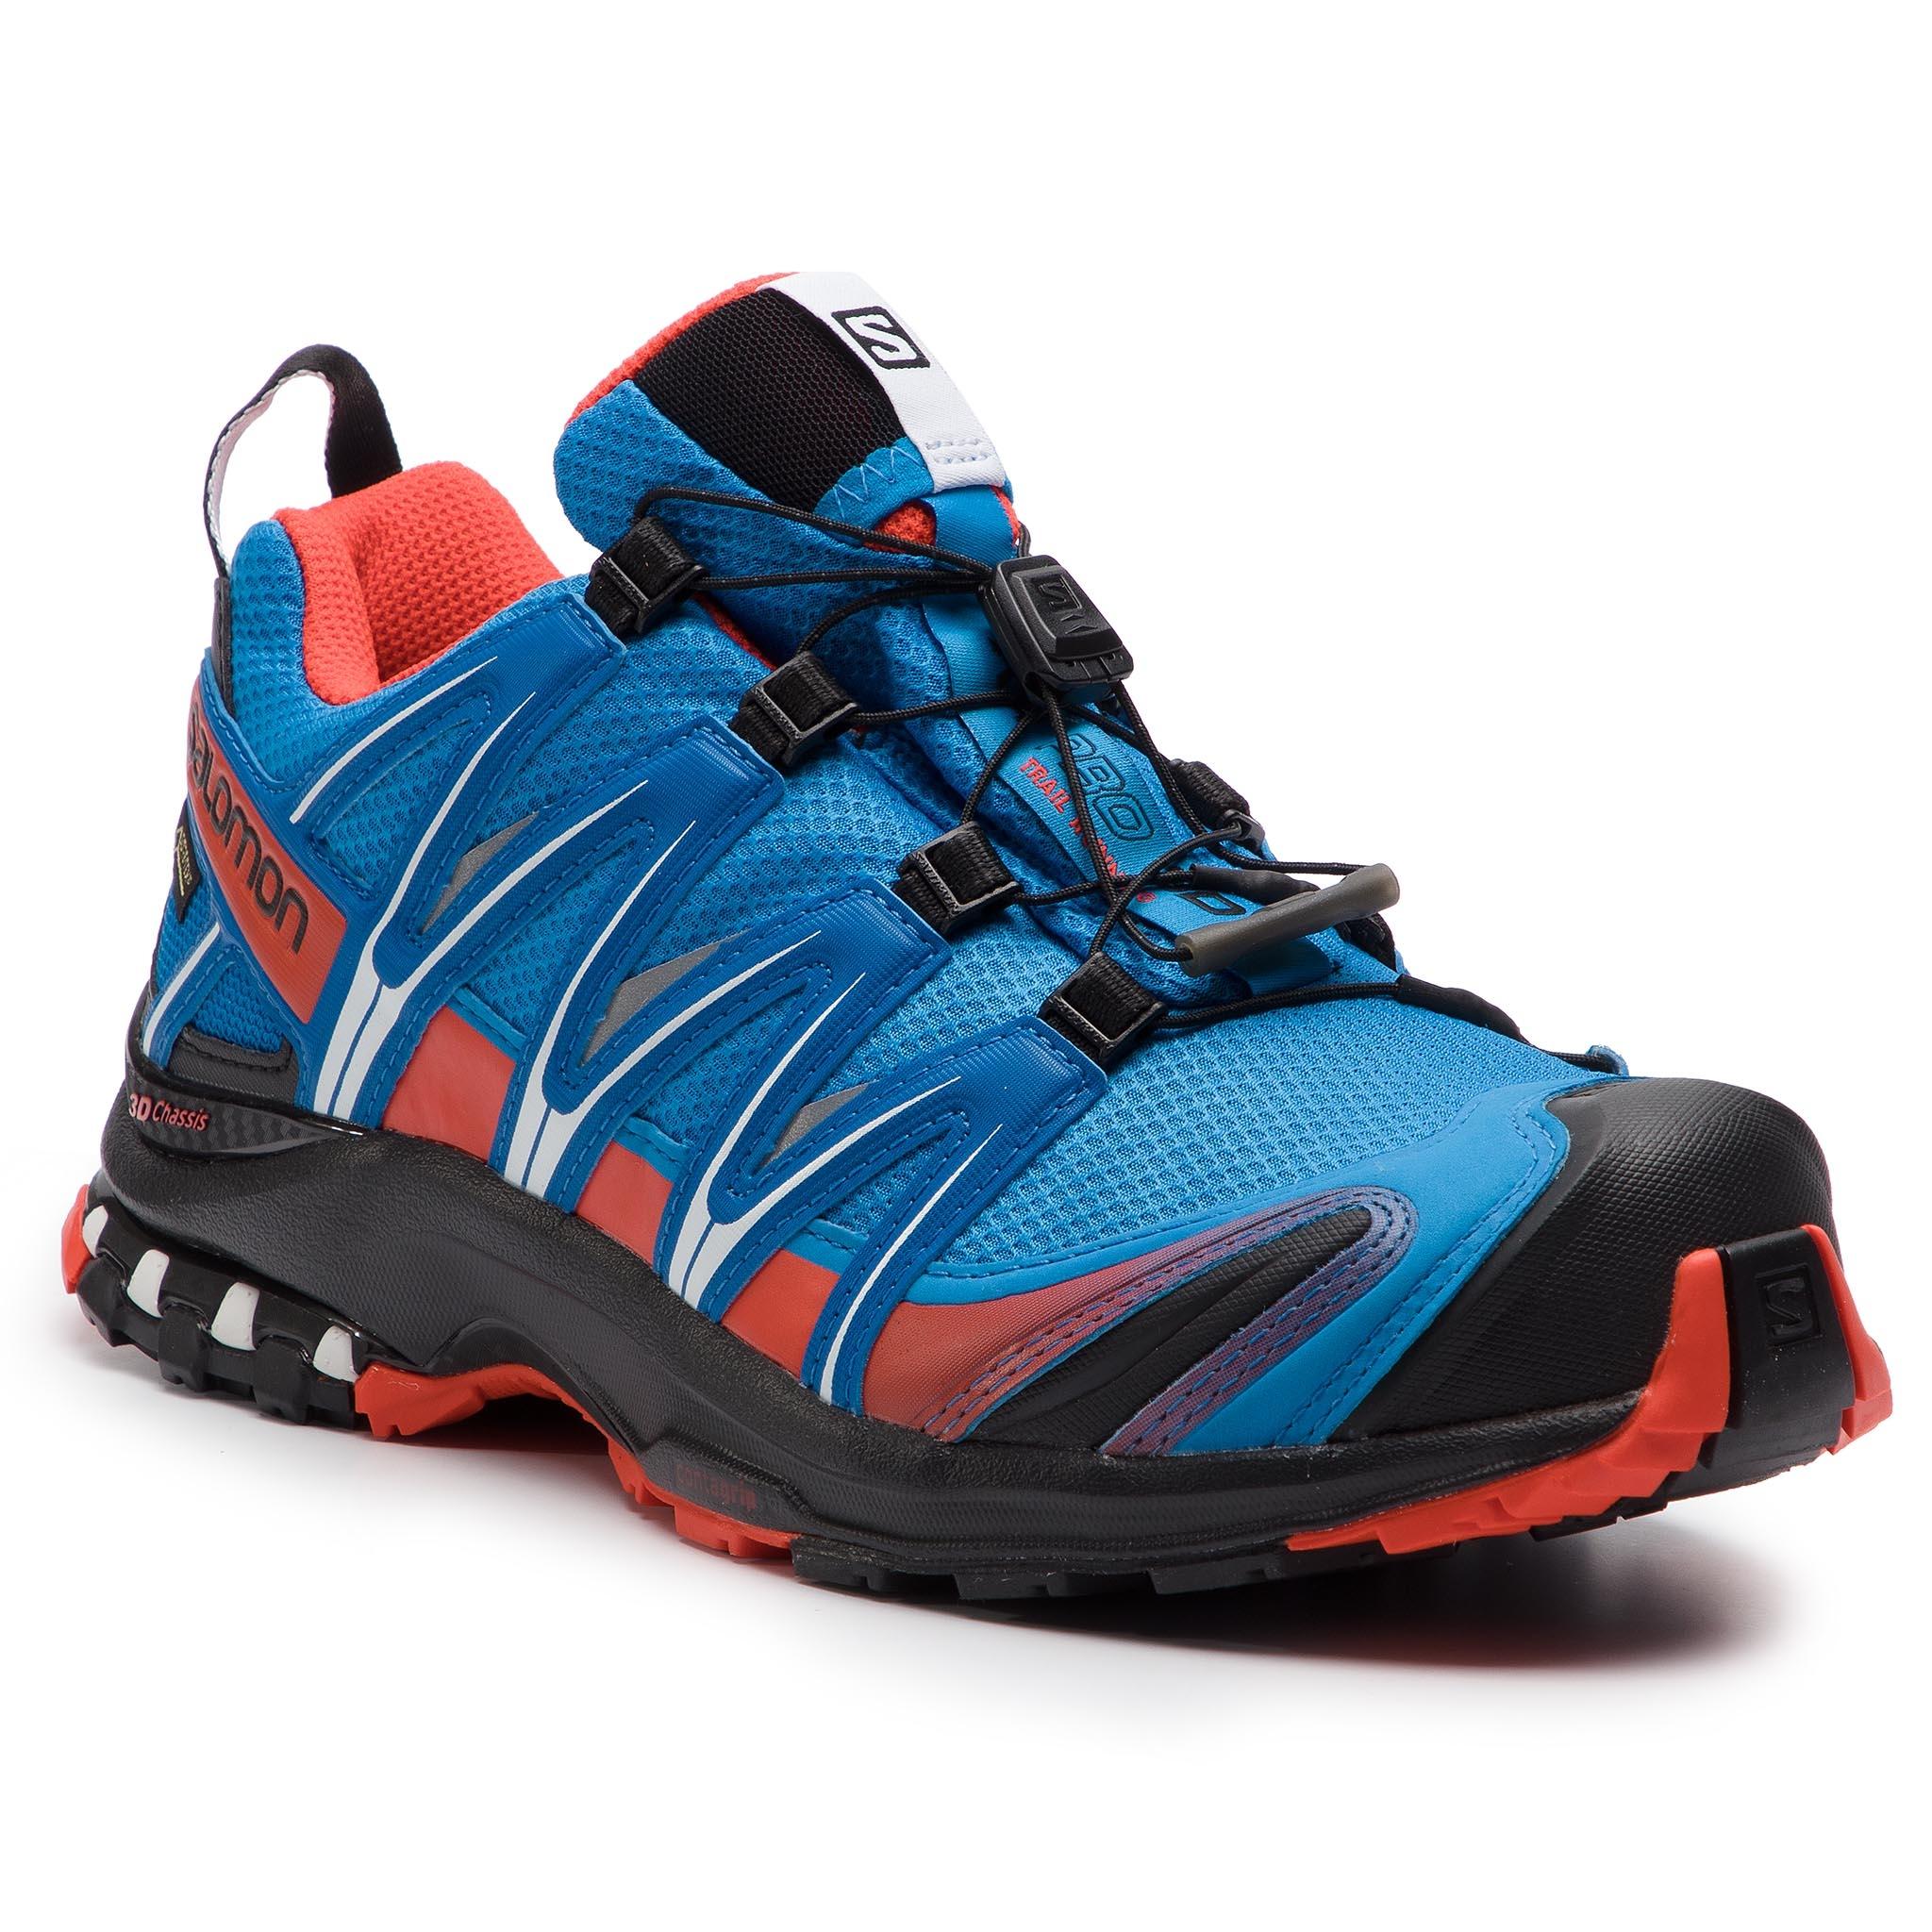 e58f2d68c50a Shoes SALOMON Xa Pro 3D Gtx GORE-TEX 406715 27 V0 Indigo Bunting Sky  Diver Cherry Tomato